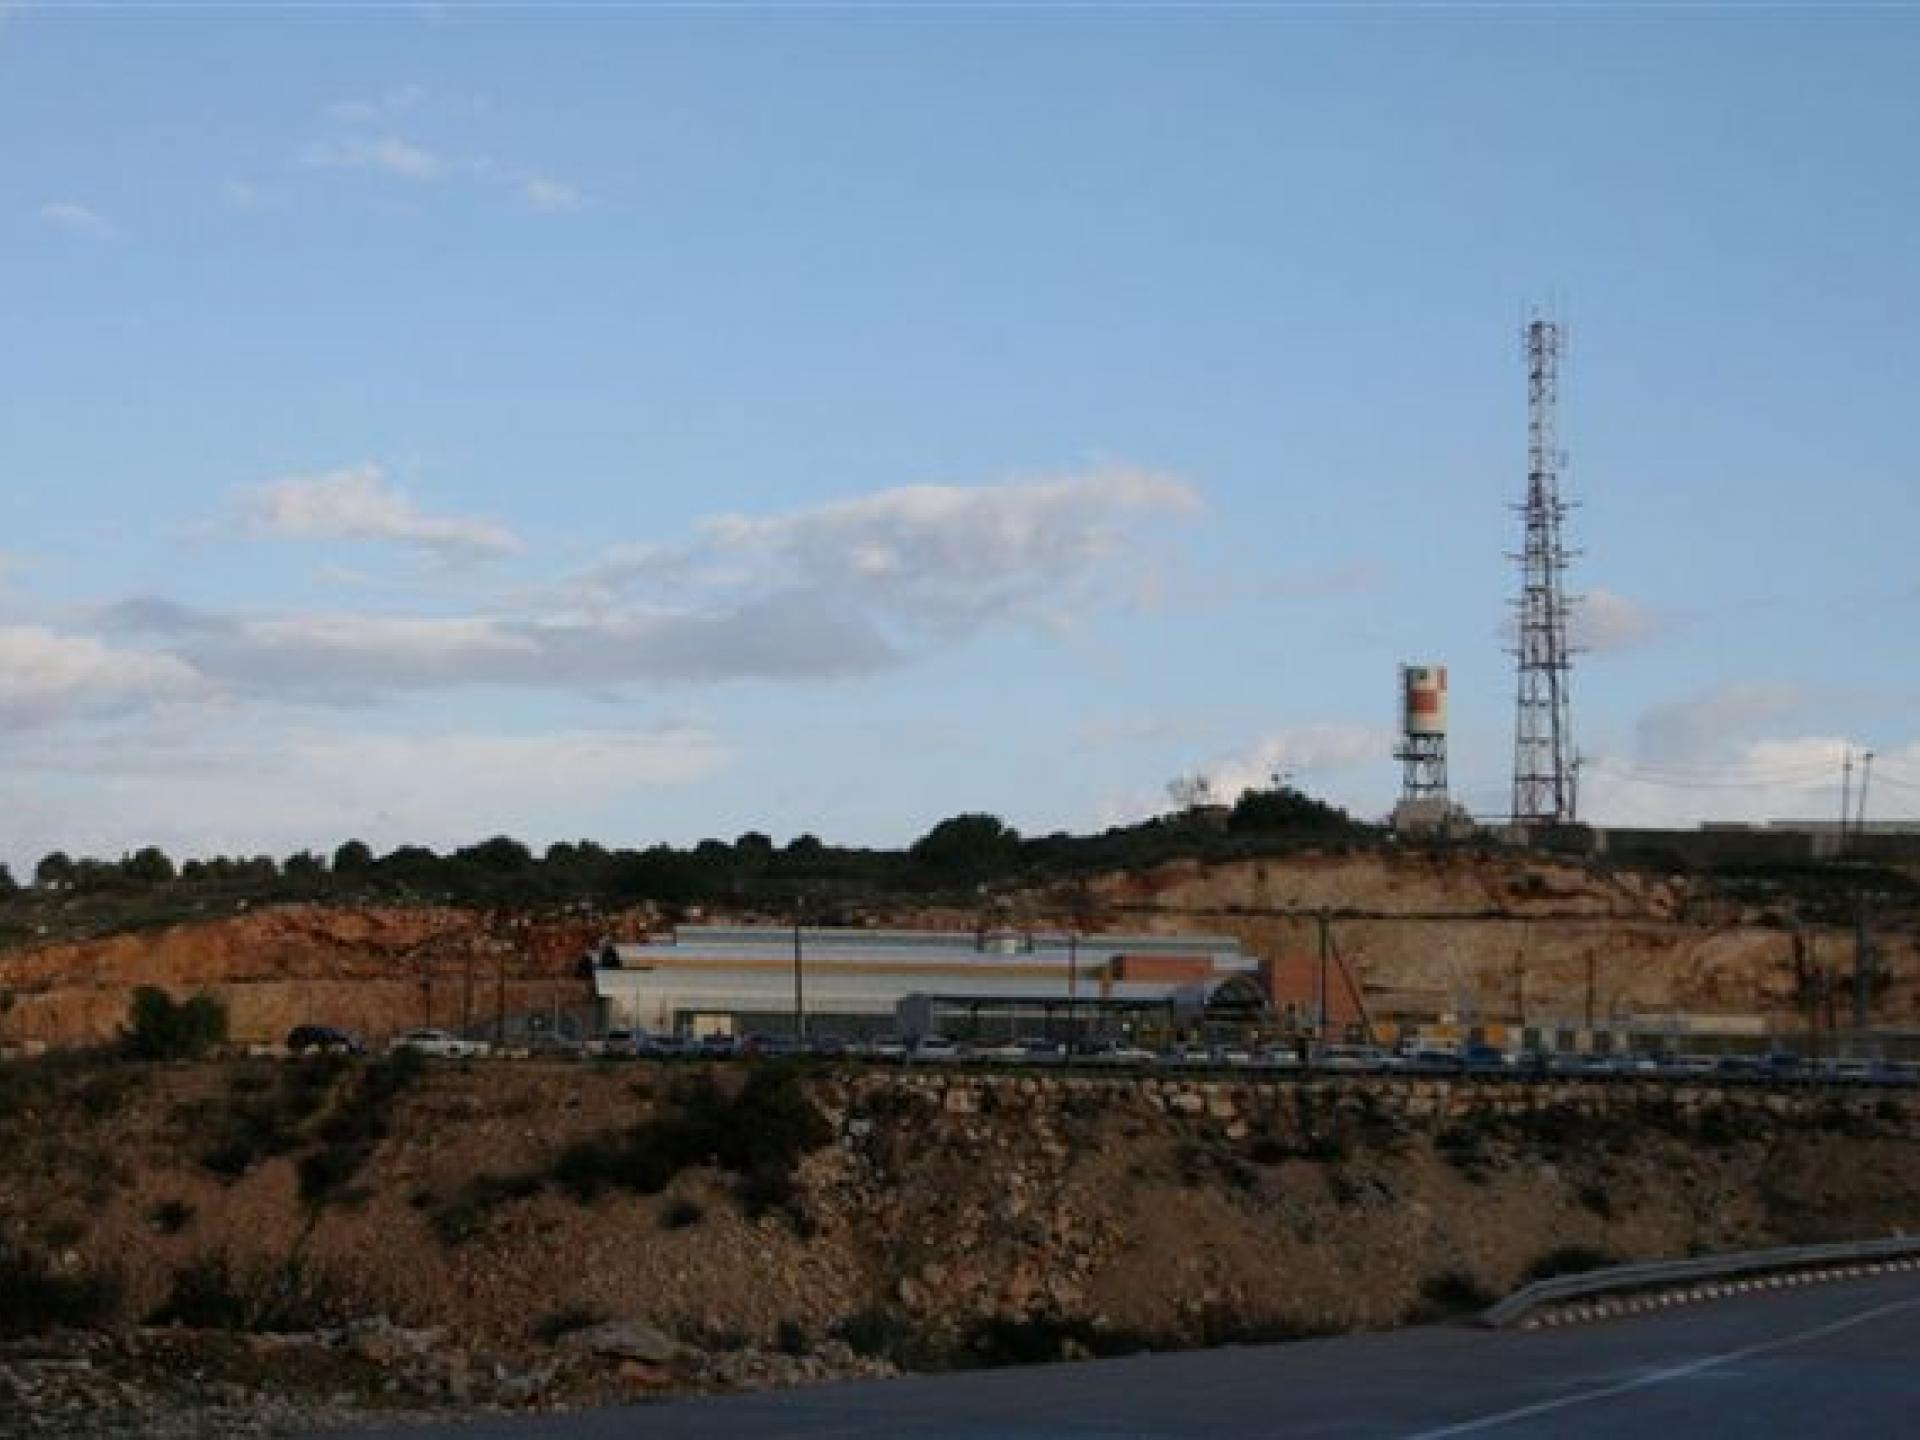 Barta'a/Reikhan checkpoint 08.01.11